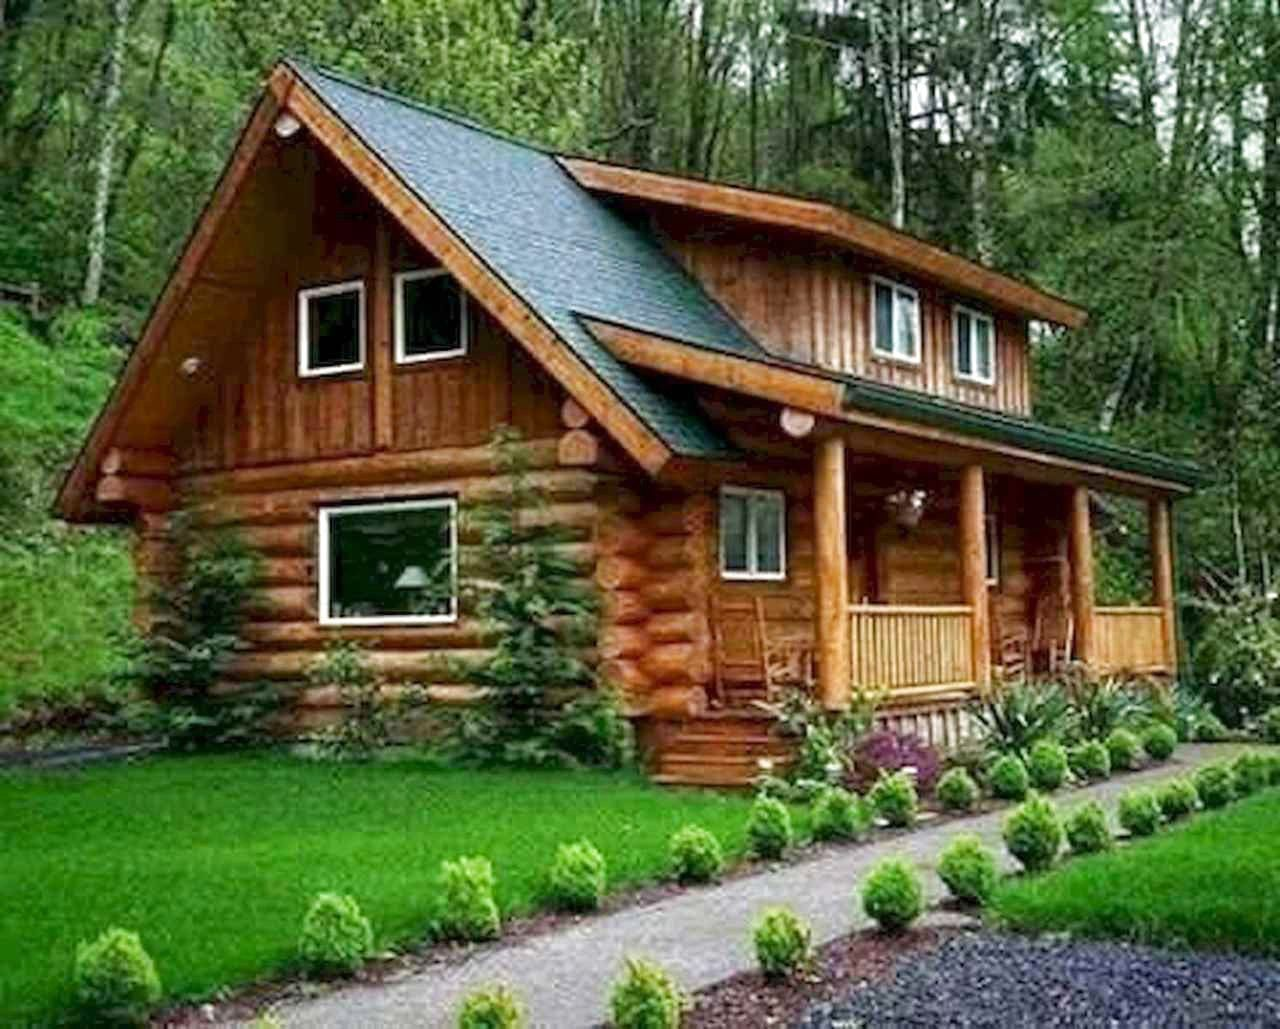 77 Favourite Log Cabin Homes Plans Design Ideas The Expert Beautiful Ideas Log Cabin Rustic Log Cabin Homes Cabin Homes